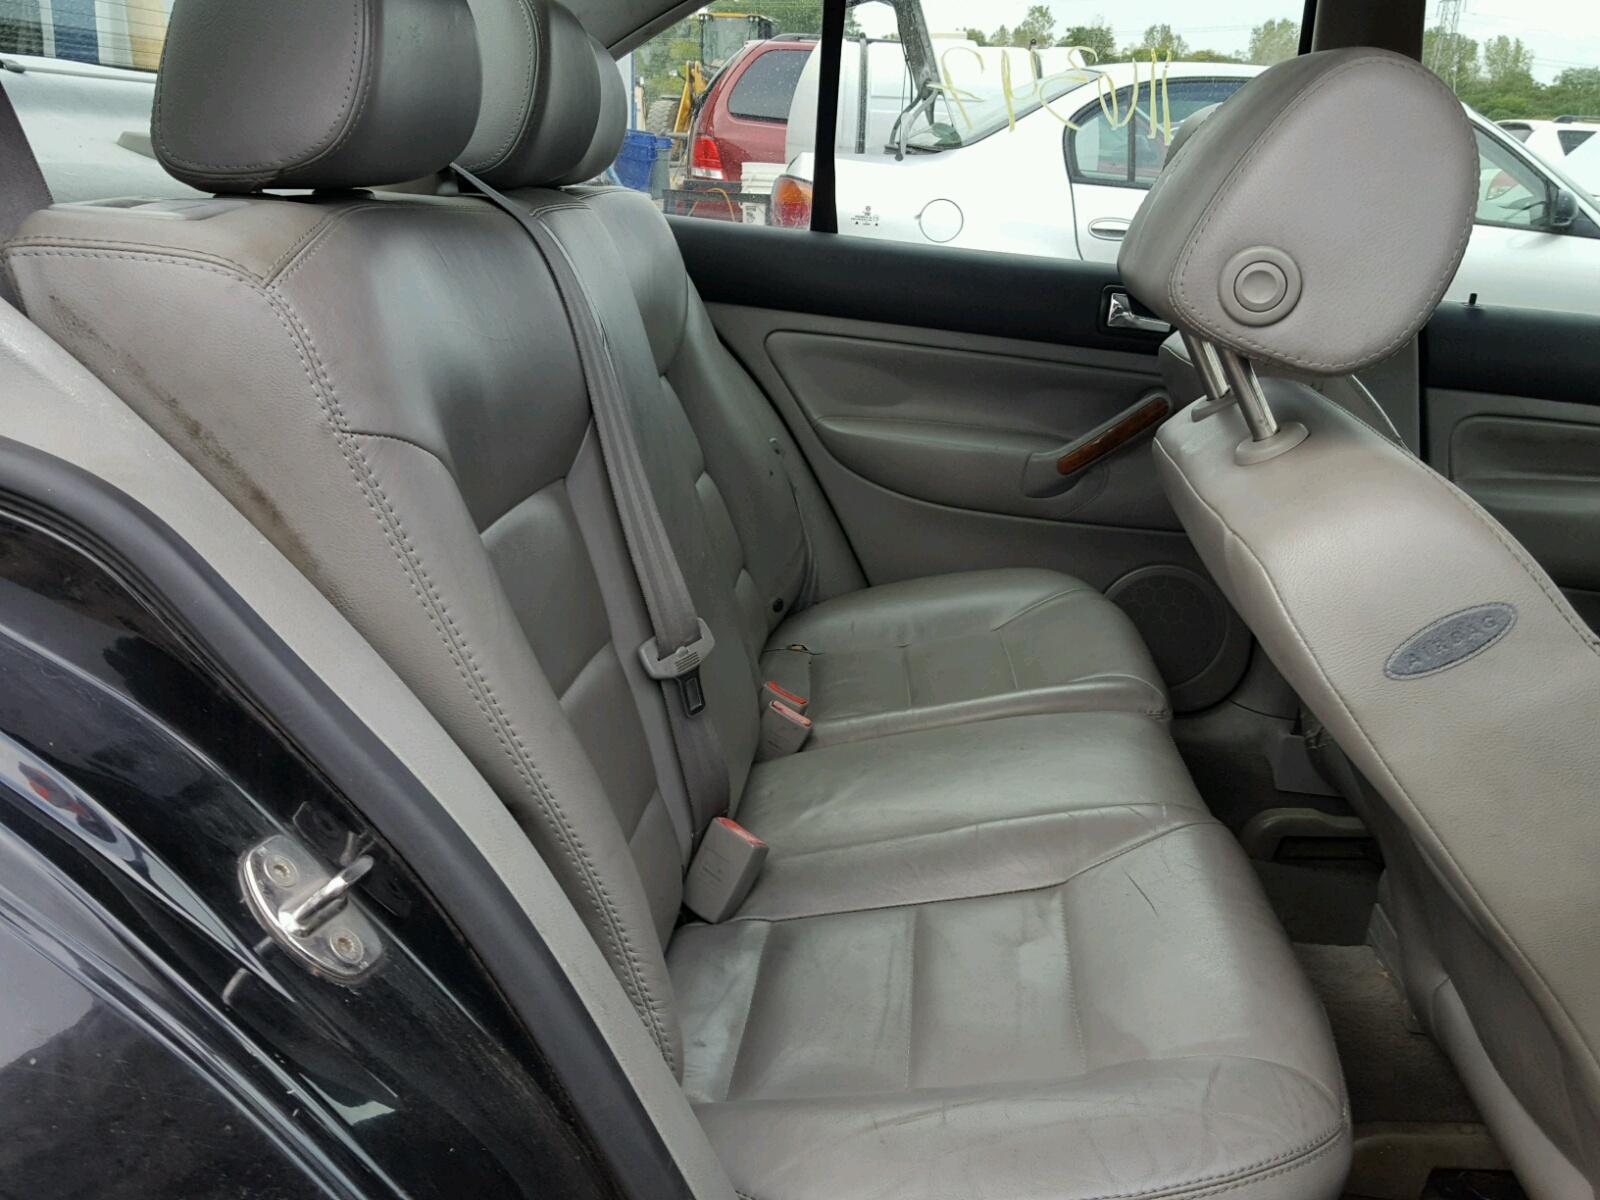 2001 Volkswagen Jetta Glx For Sale At Copart Chicago Heights Il Lot Sedan